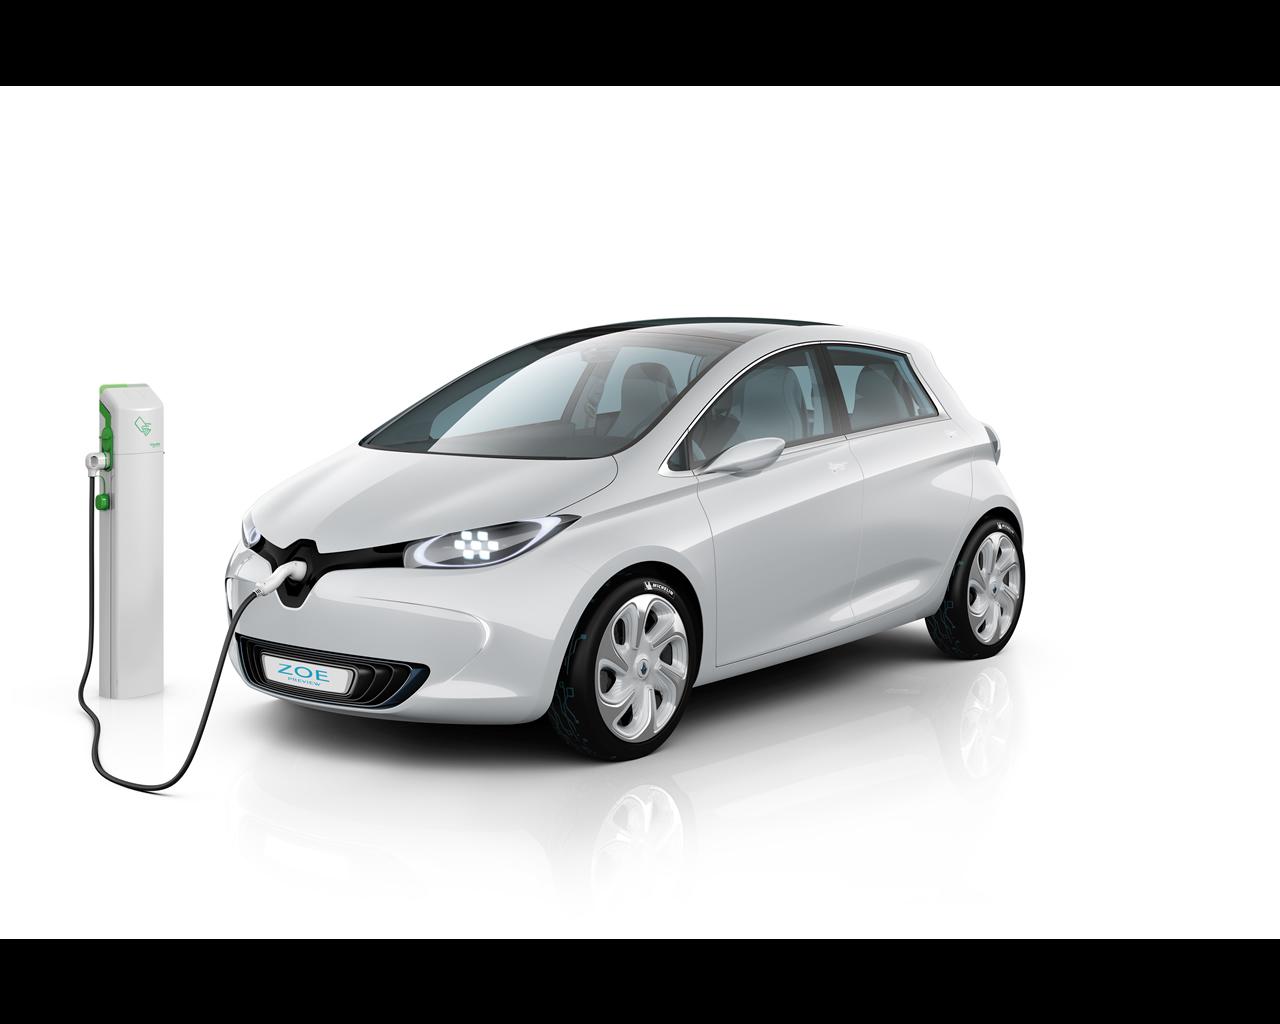 Renault Zoe 2012 Preview Zero Emission Everyday Car